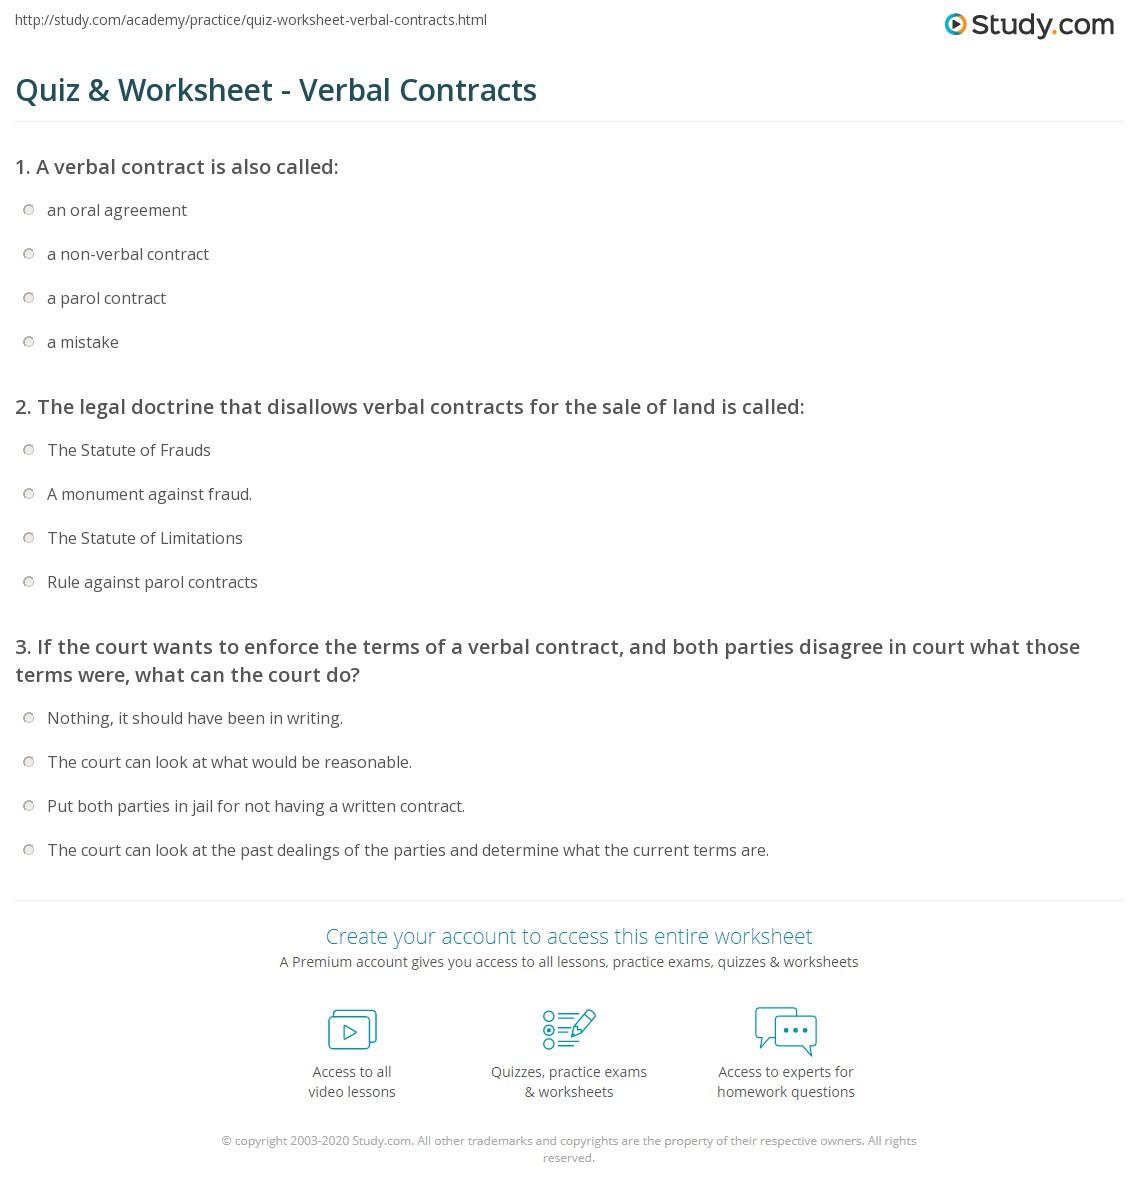 Quiz Worksheet Verbal Contracts Study